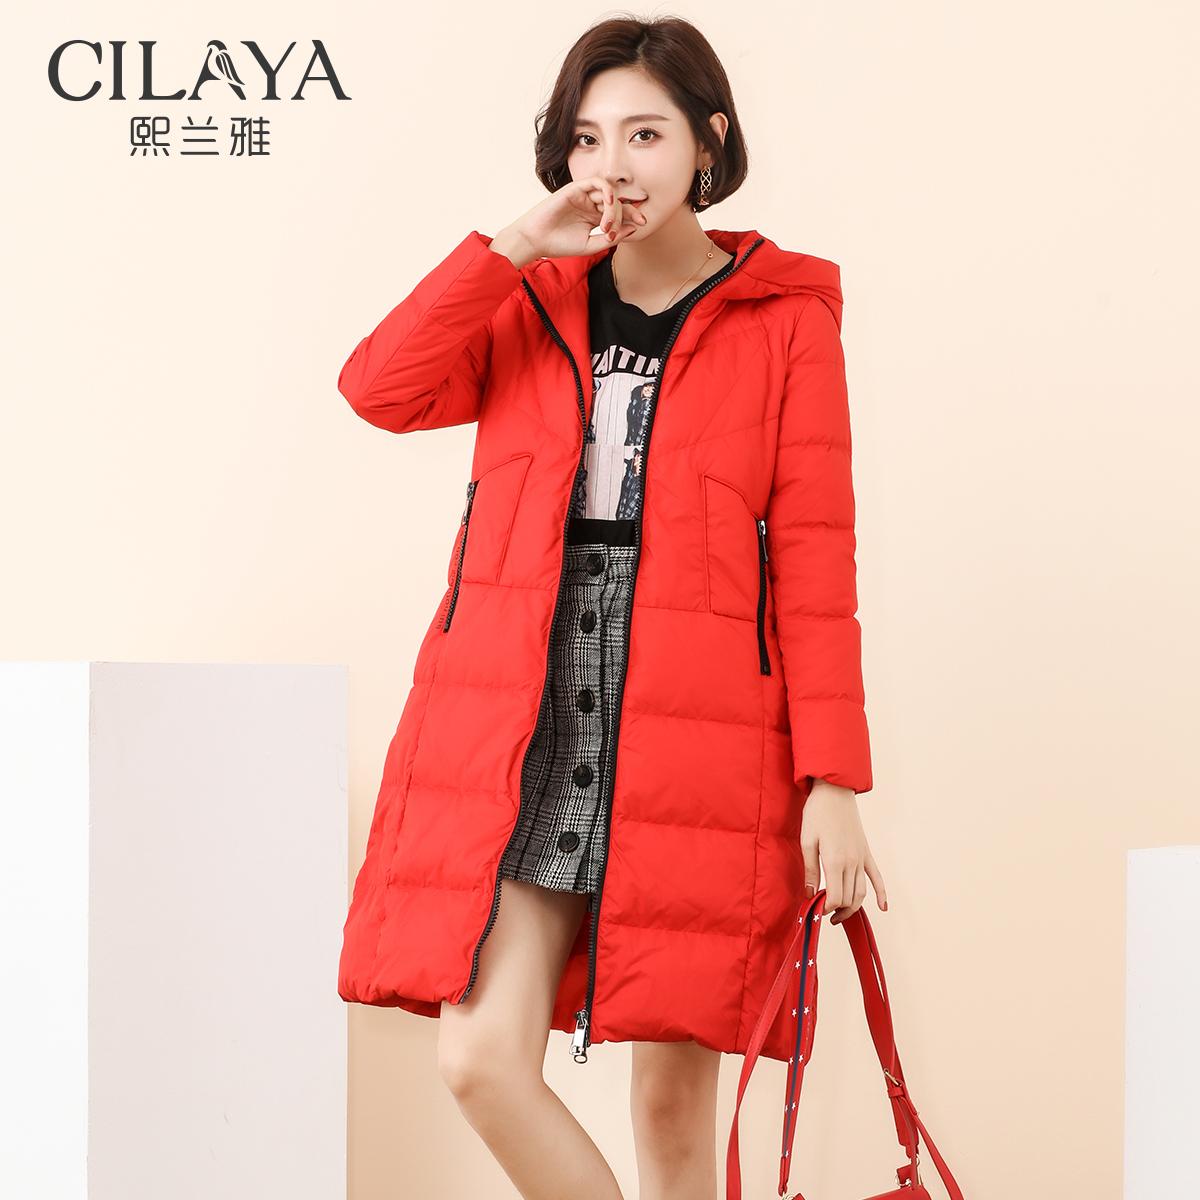 Cilaya/熙兰雅2019冬季新款韩版羽绒服女中长款加厚修身保暖外套